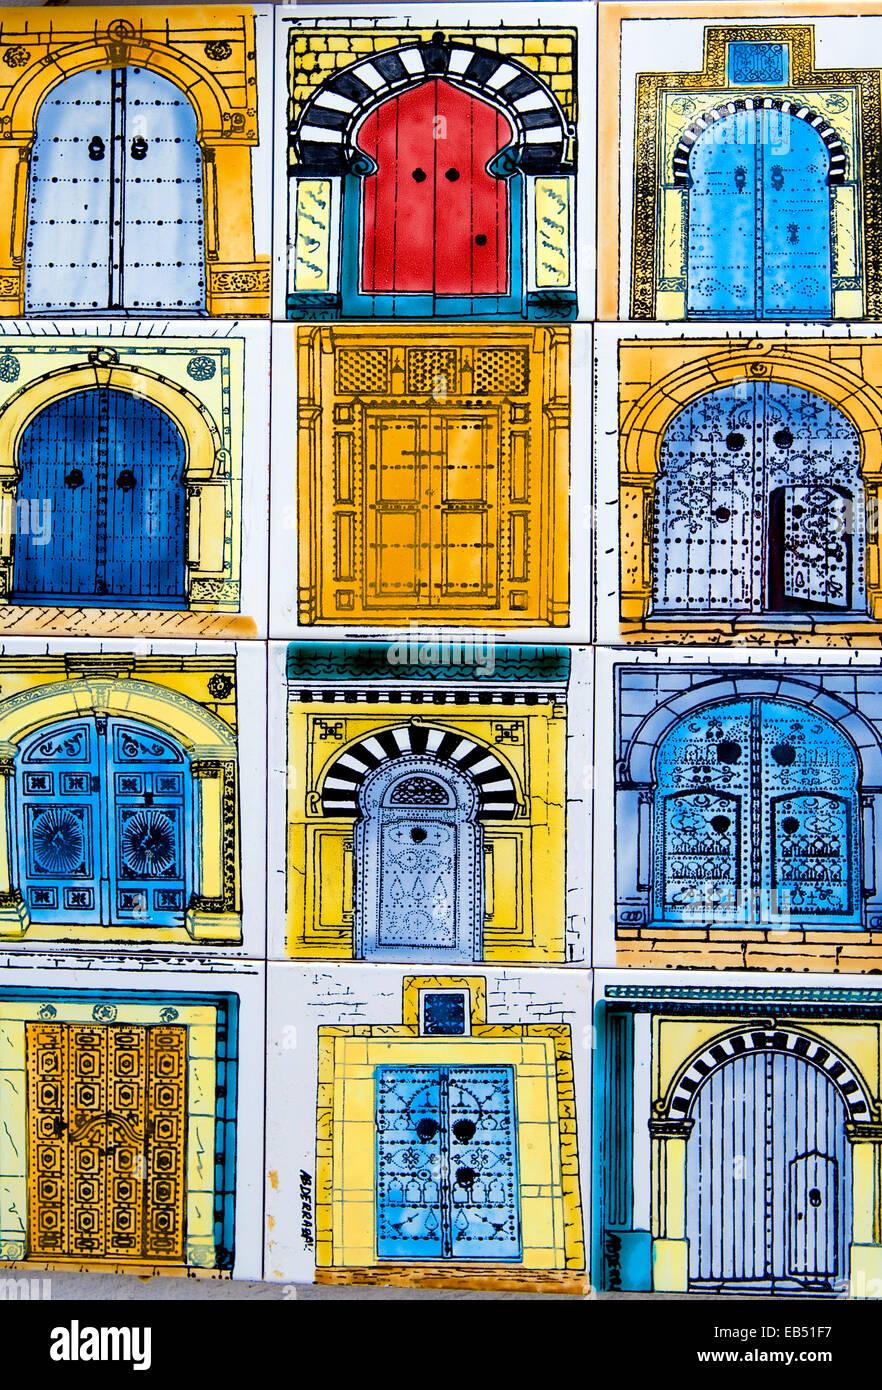 Tunisia, Sidi Bou Said, a shop of ceramic works, detail - Stock Image